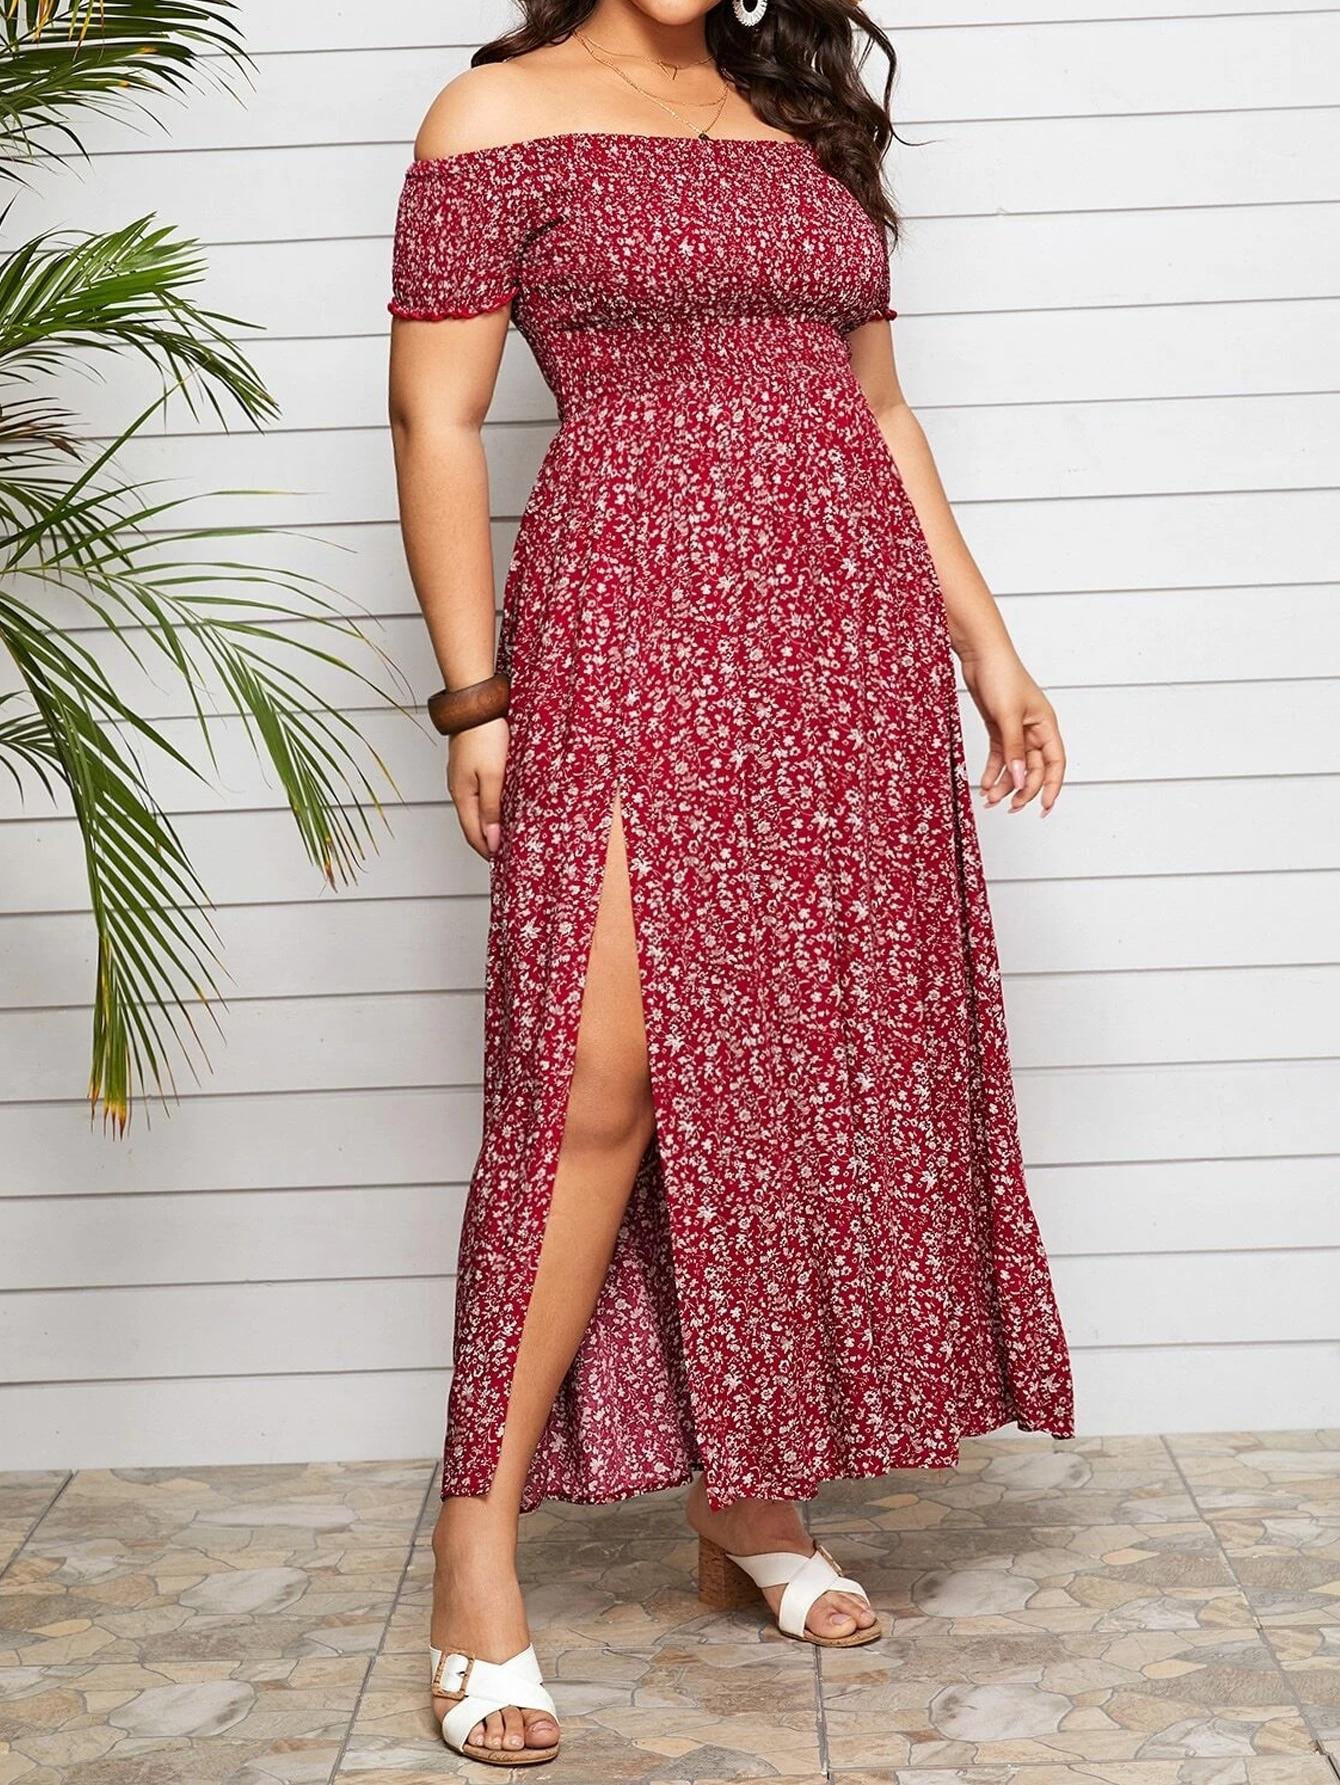 2021 Summer Dress Women Slash Neck Floral Print Off Shoulder Dress Plus Size Asymmetrical High Split Sexy Bohemian Beach Dresses